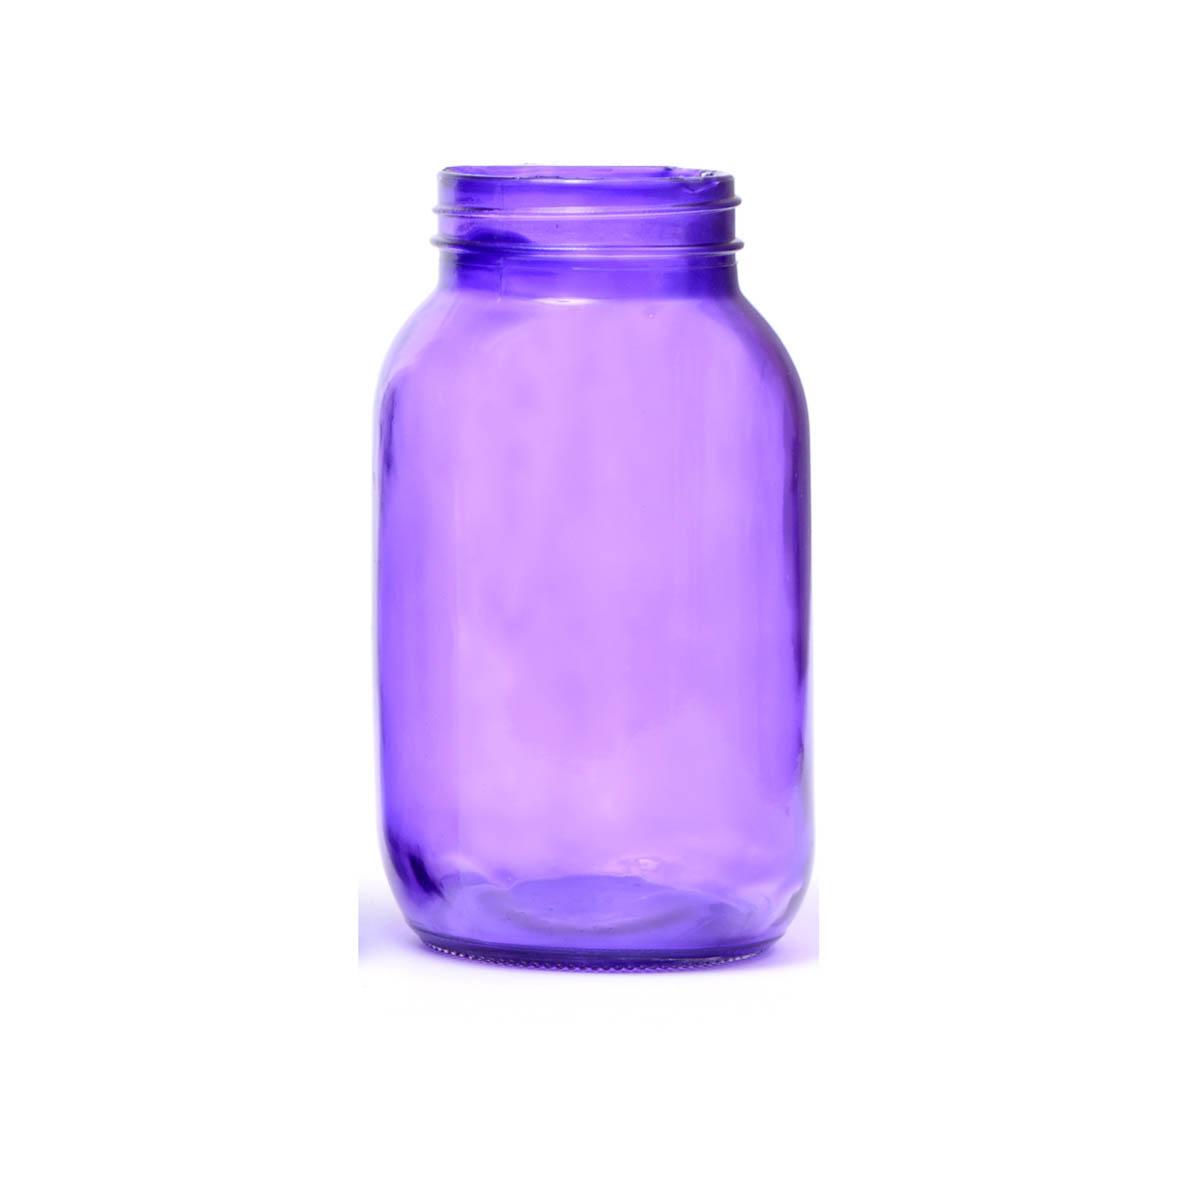 Mod Podge ® Sheer Color - Purple, 4 oz.